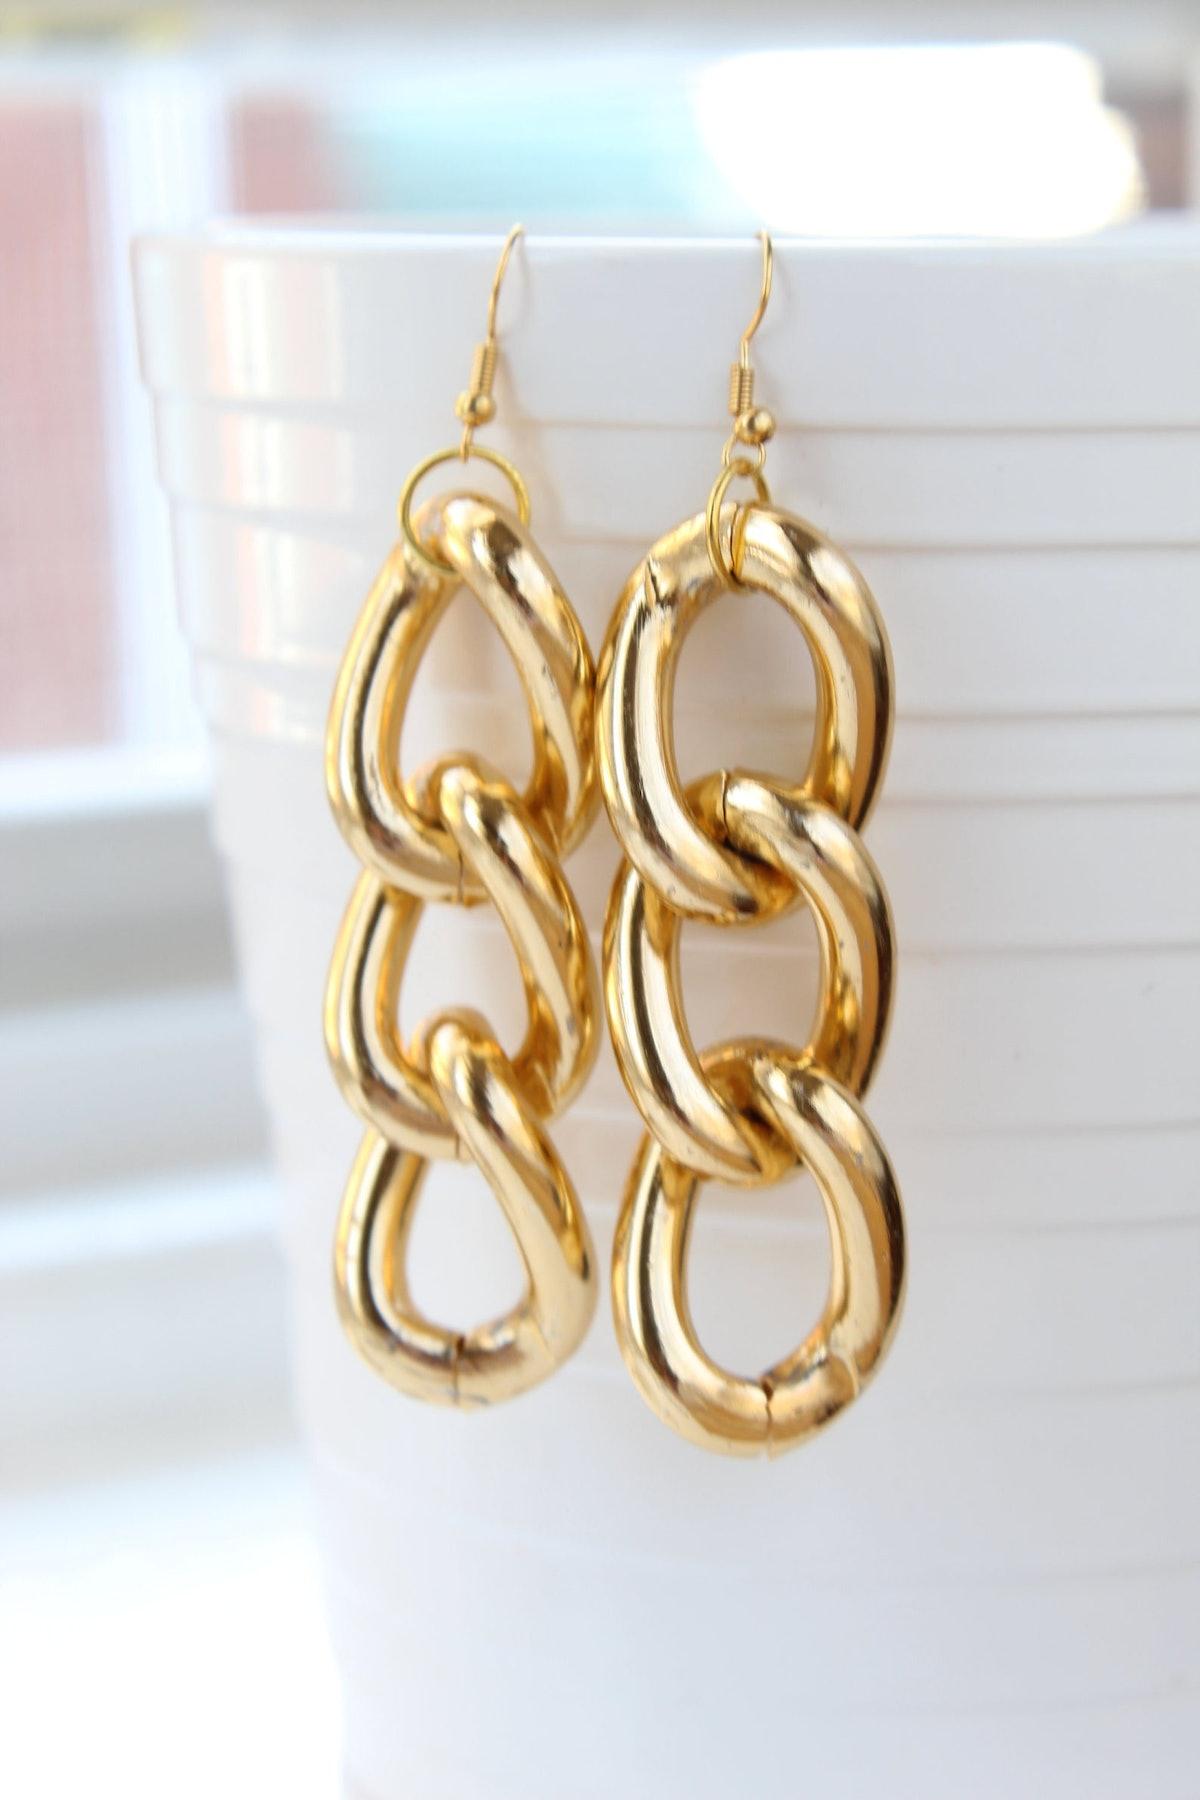 Blackberries Box Gold Plated Chain Link Earrings